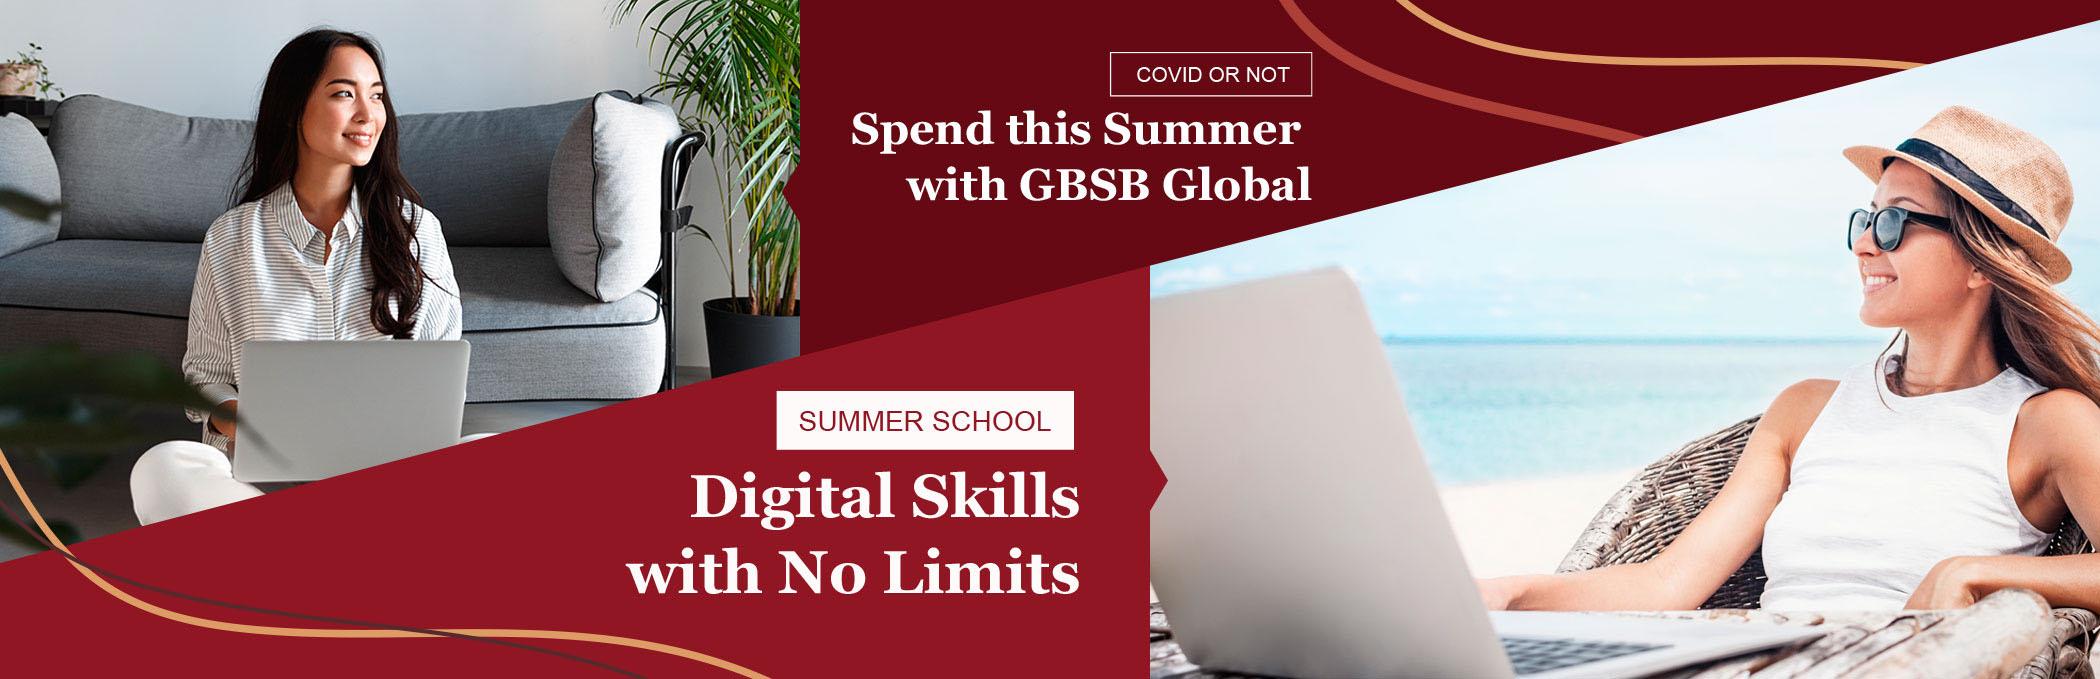 GBSB Global Business School in Europe Spend Your Summer with GBSB Global